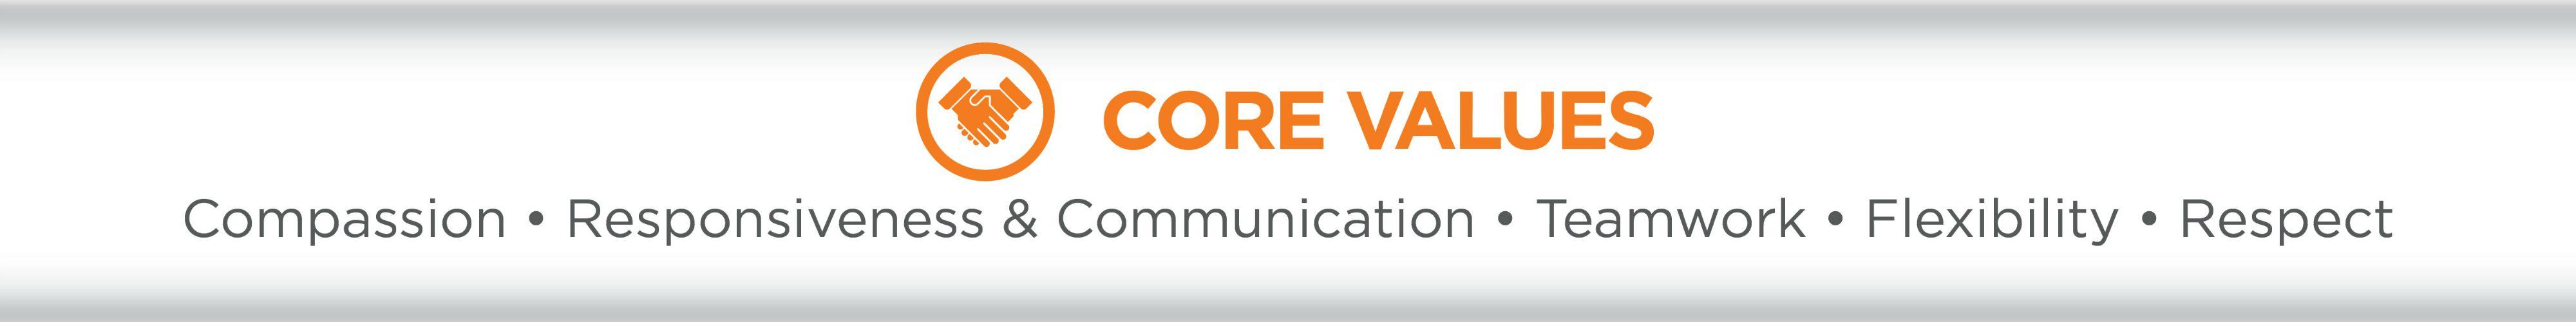 List of core values, Compassion, Responsiveness & Communication,Teamwork, Flexibility, Respect